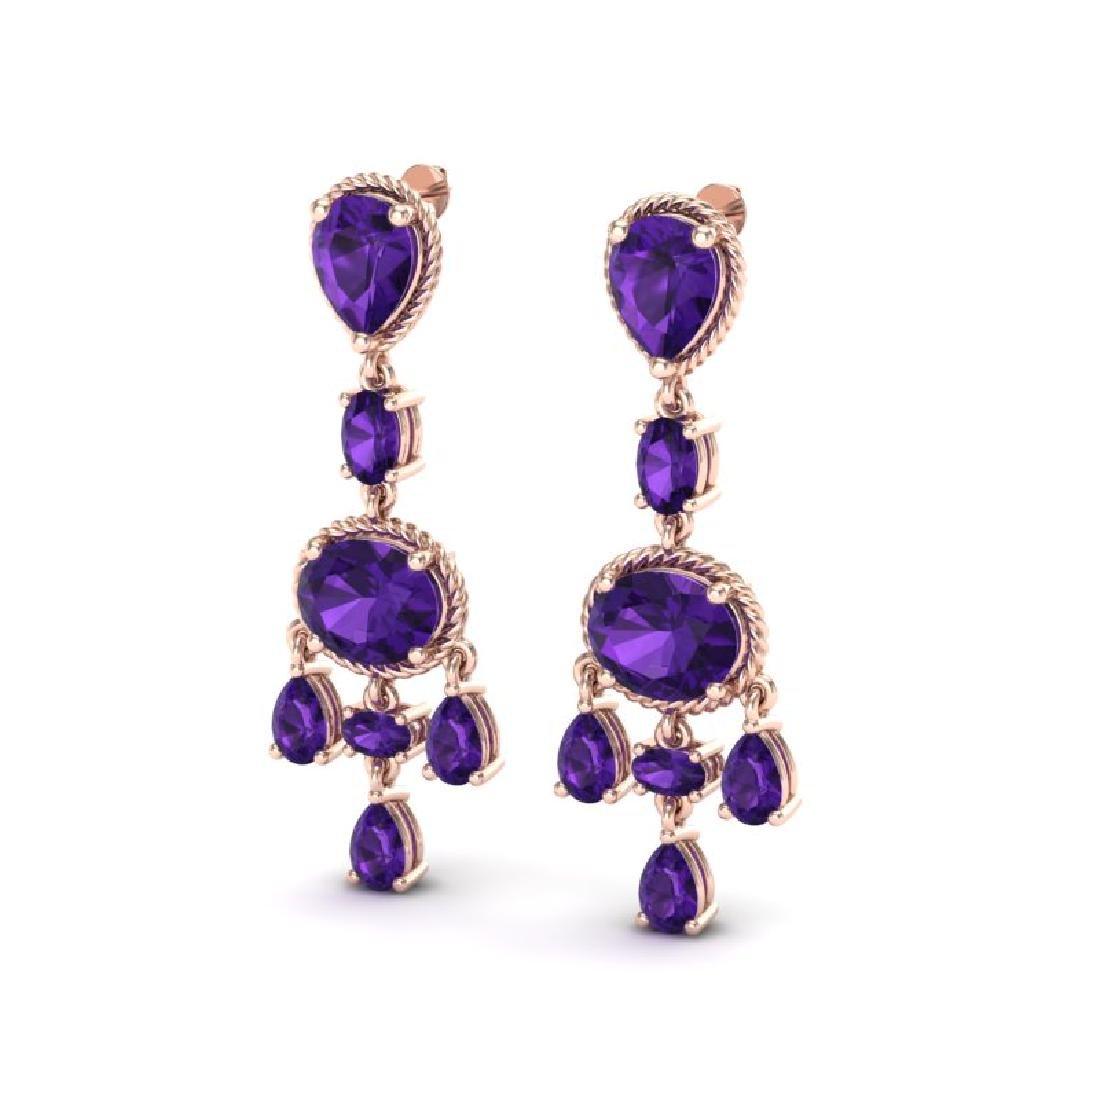 16 CTW Amethyst Earrings Designer Vintage 10K Rose Gold